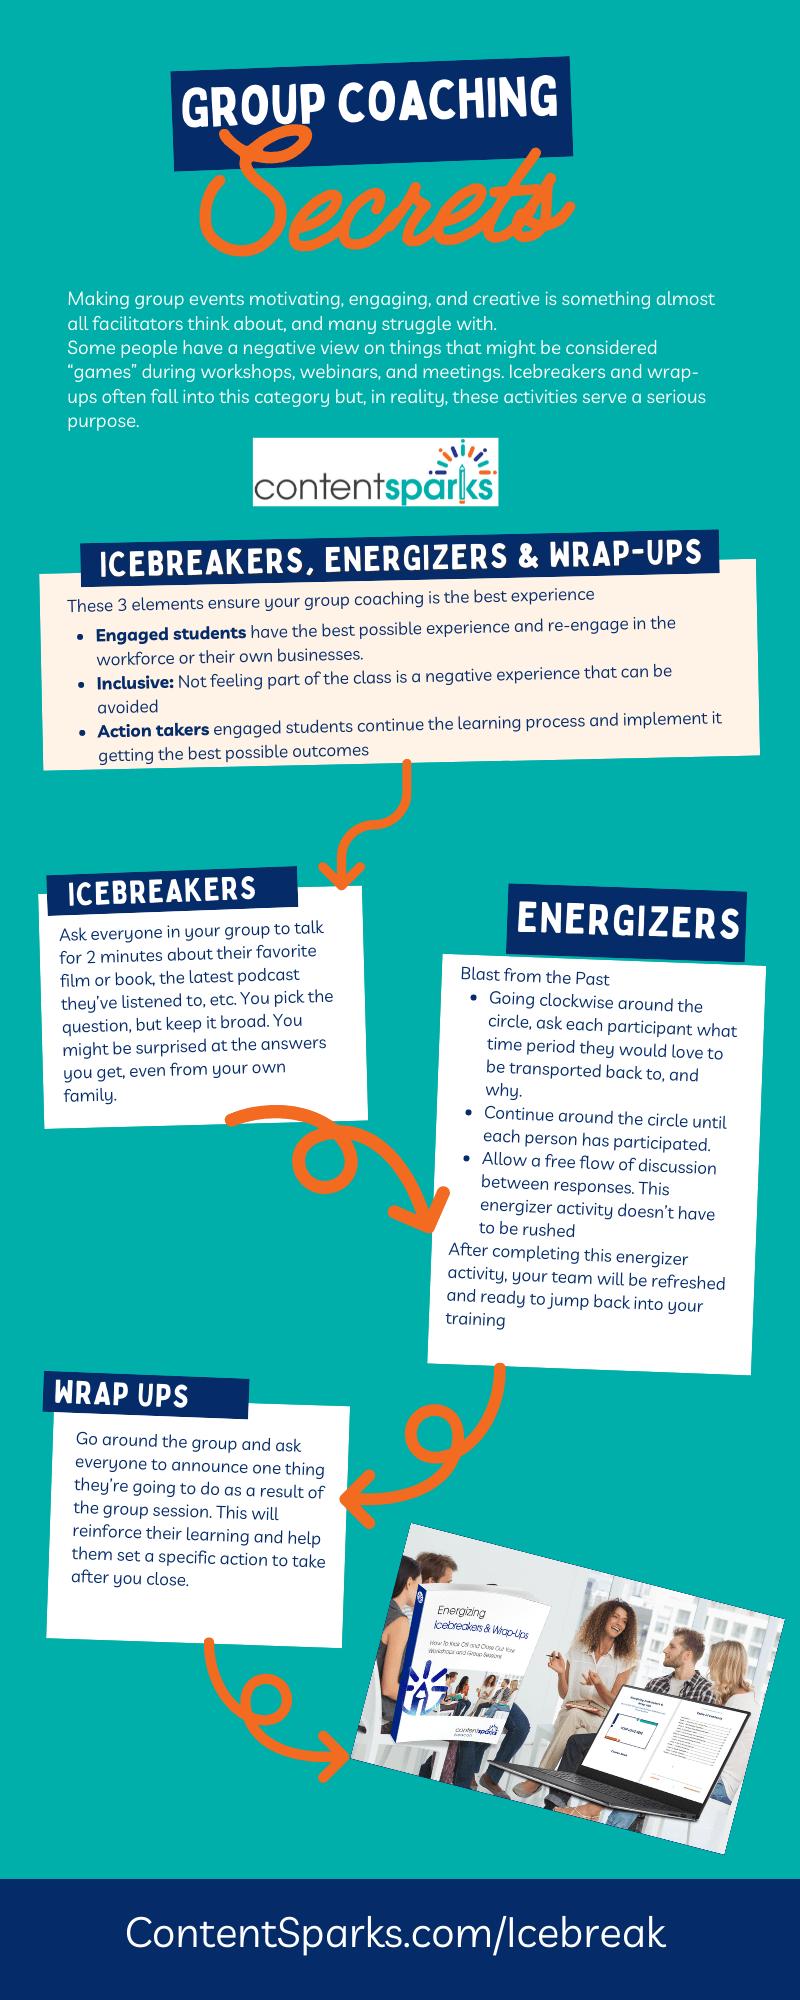 Group coaching icebreaker infographic